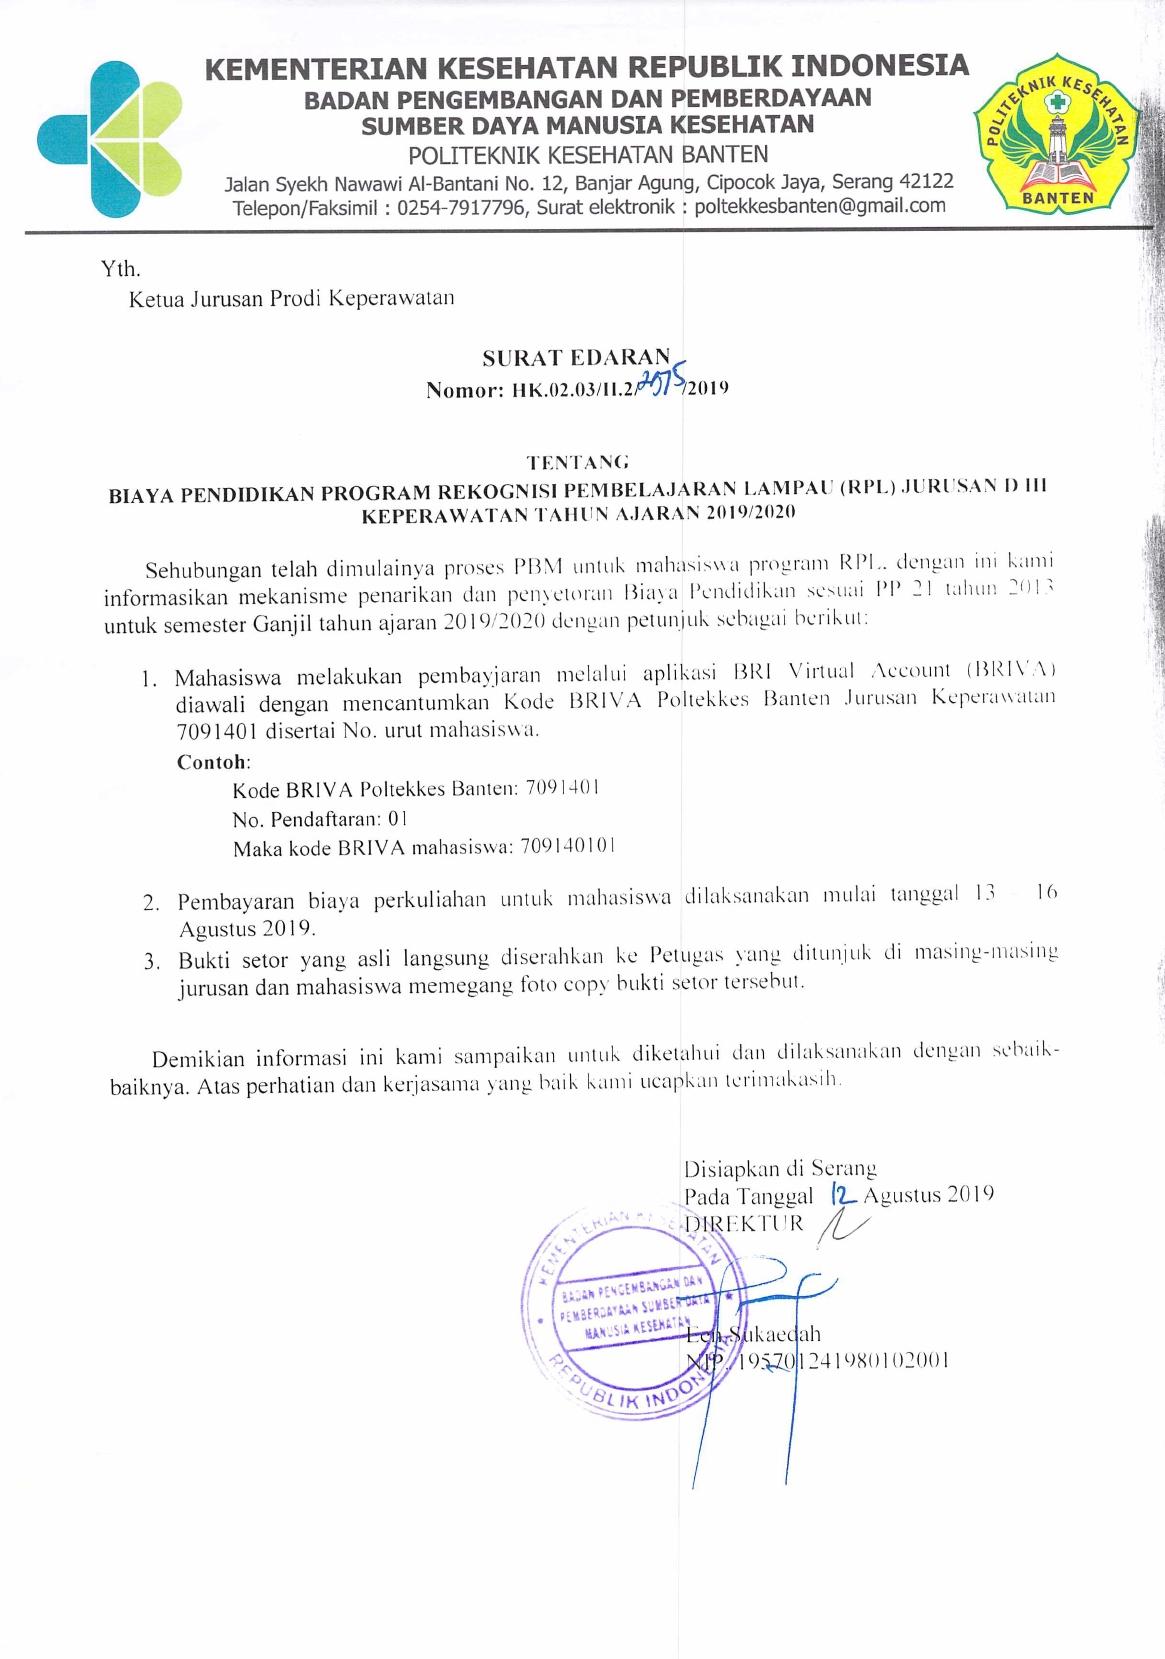 Surat Edaran Biaya Pendidikan D3 Keperawatan Kelas Rpl Ta